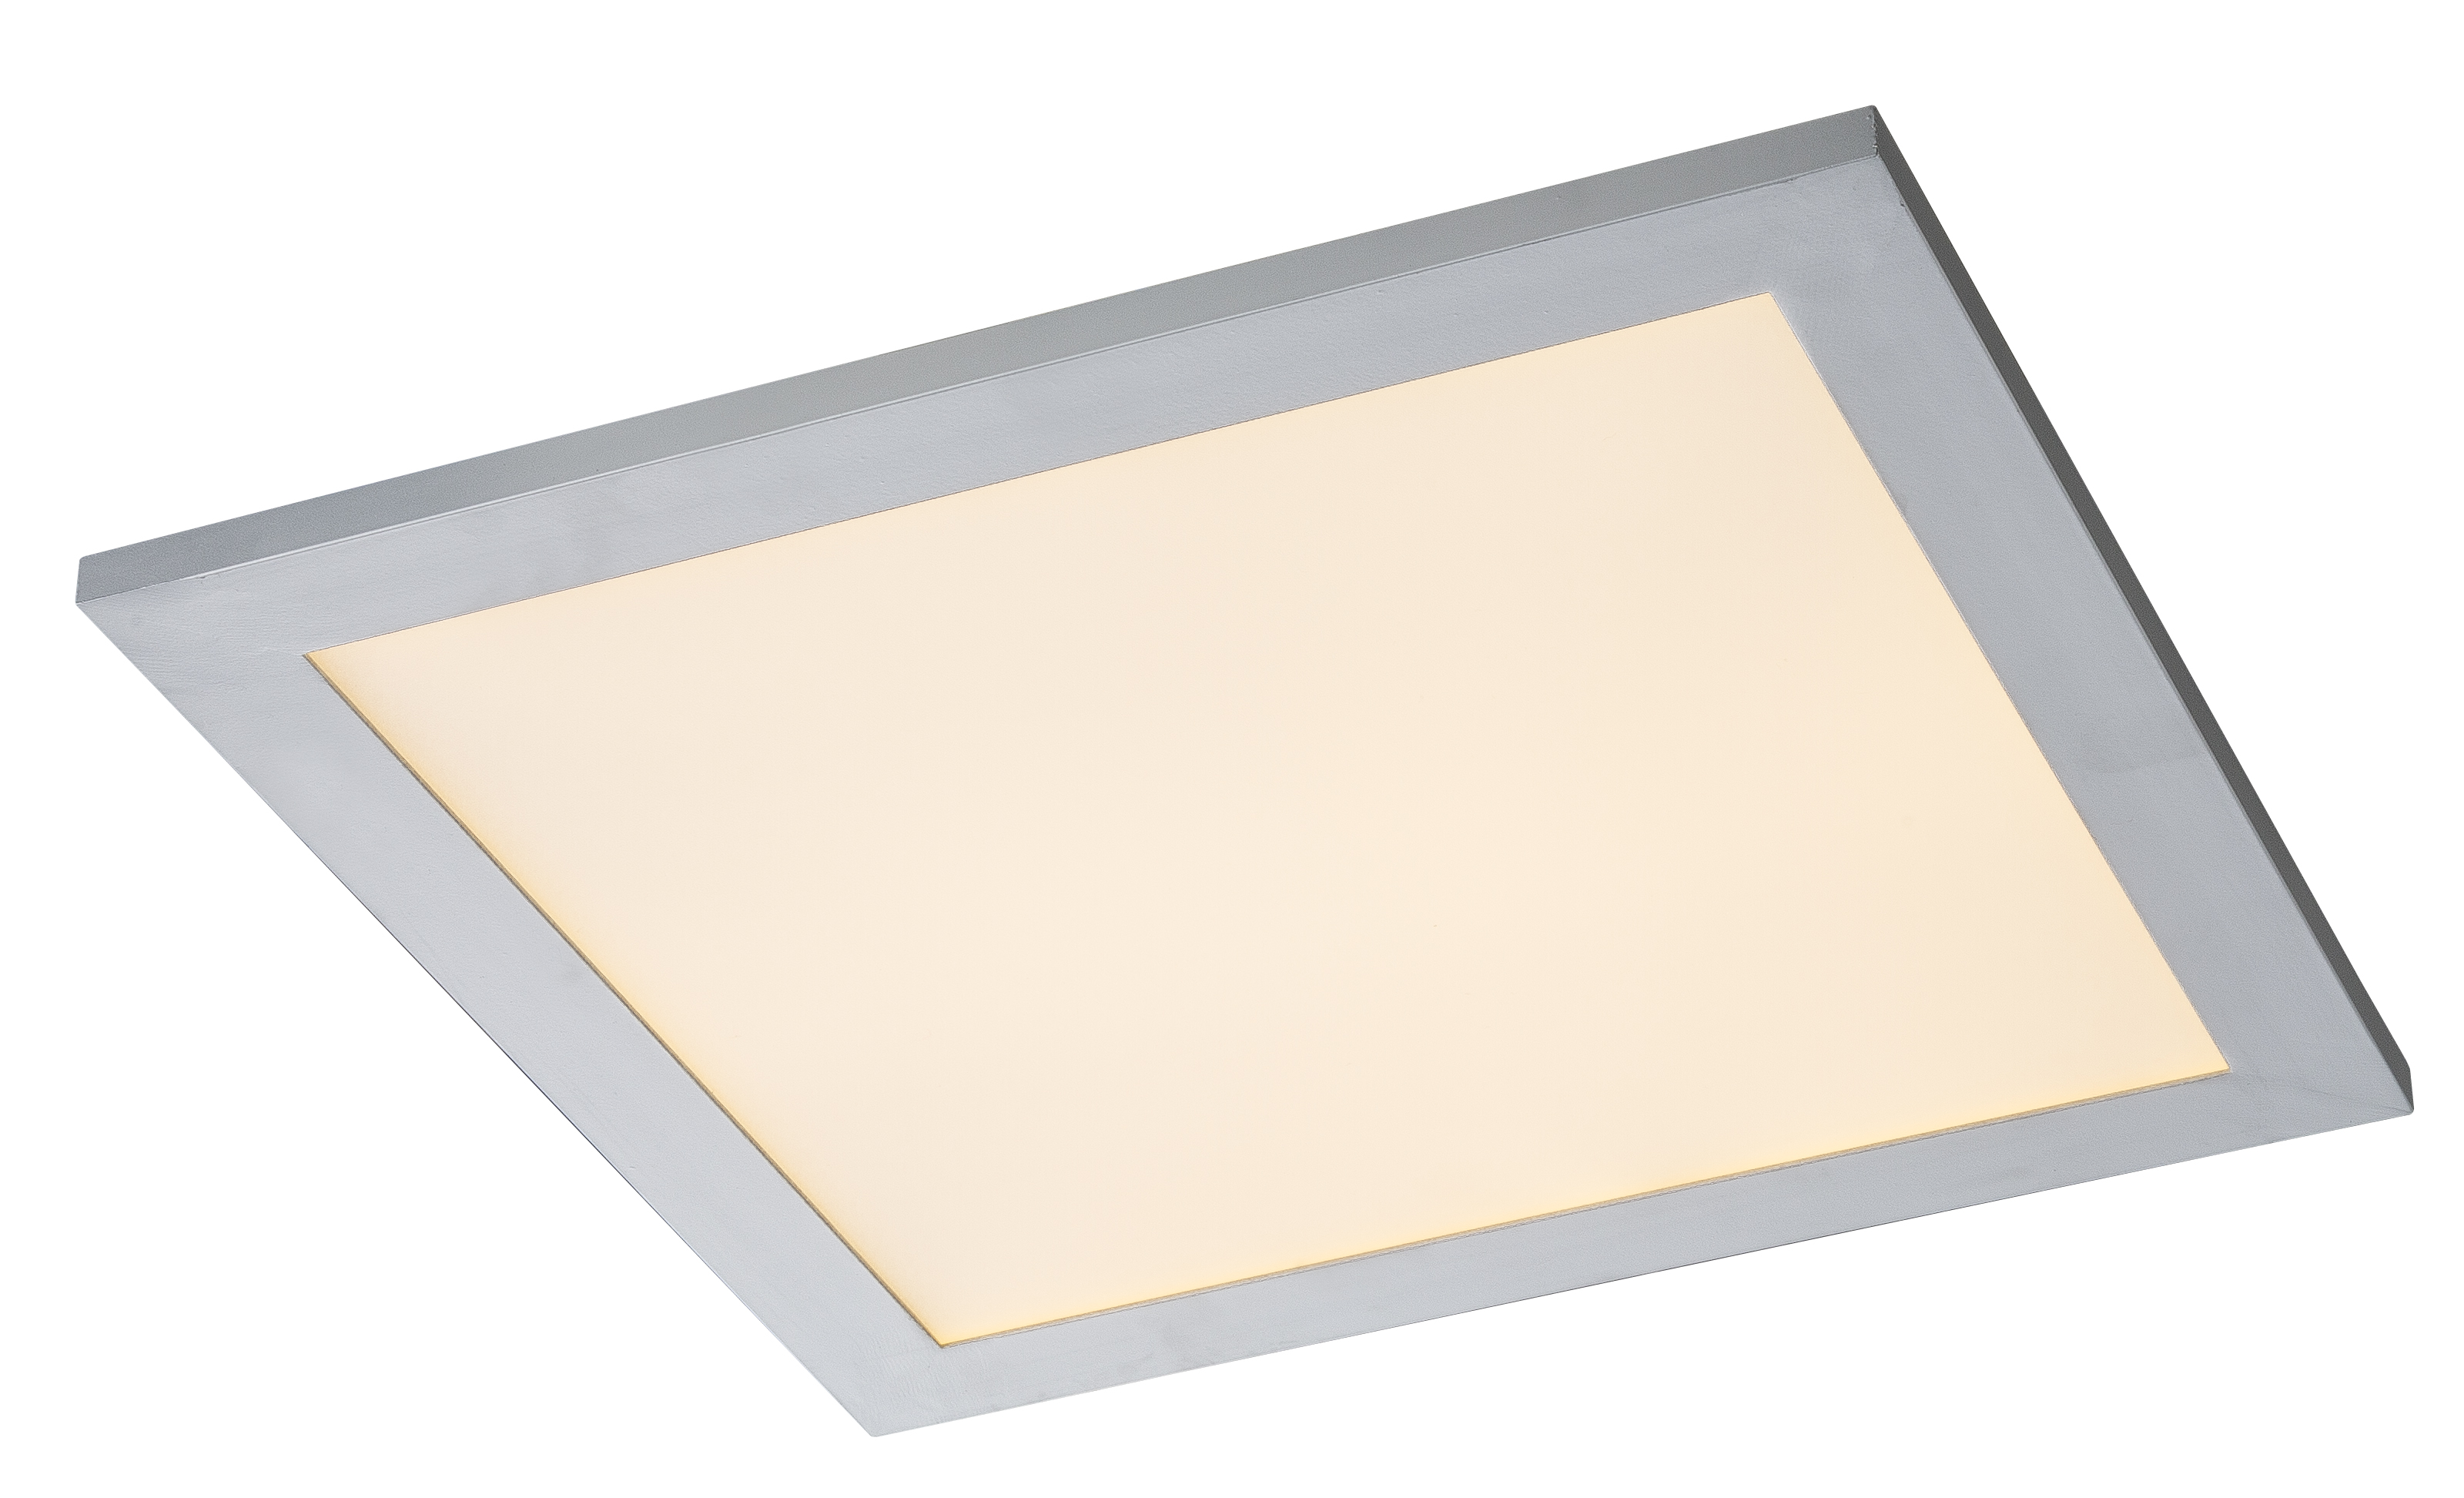 marzo schlafzimmer r ume produkte globo lighting leuchten lampen online kaufen. Black Bedroom Furniture Sets. Home Design Ideas